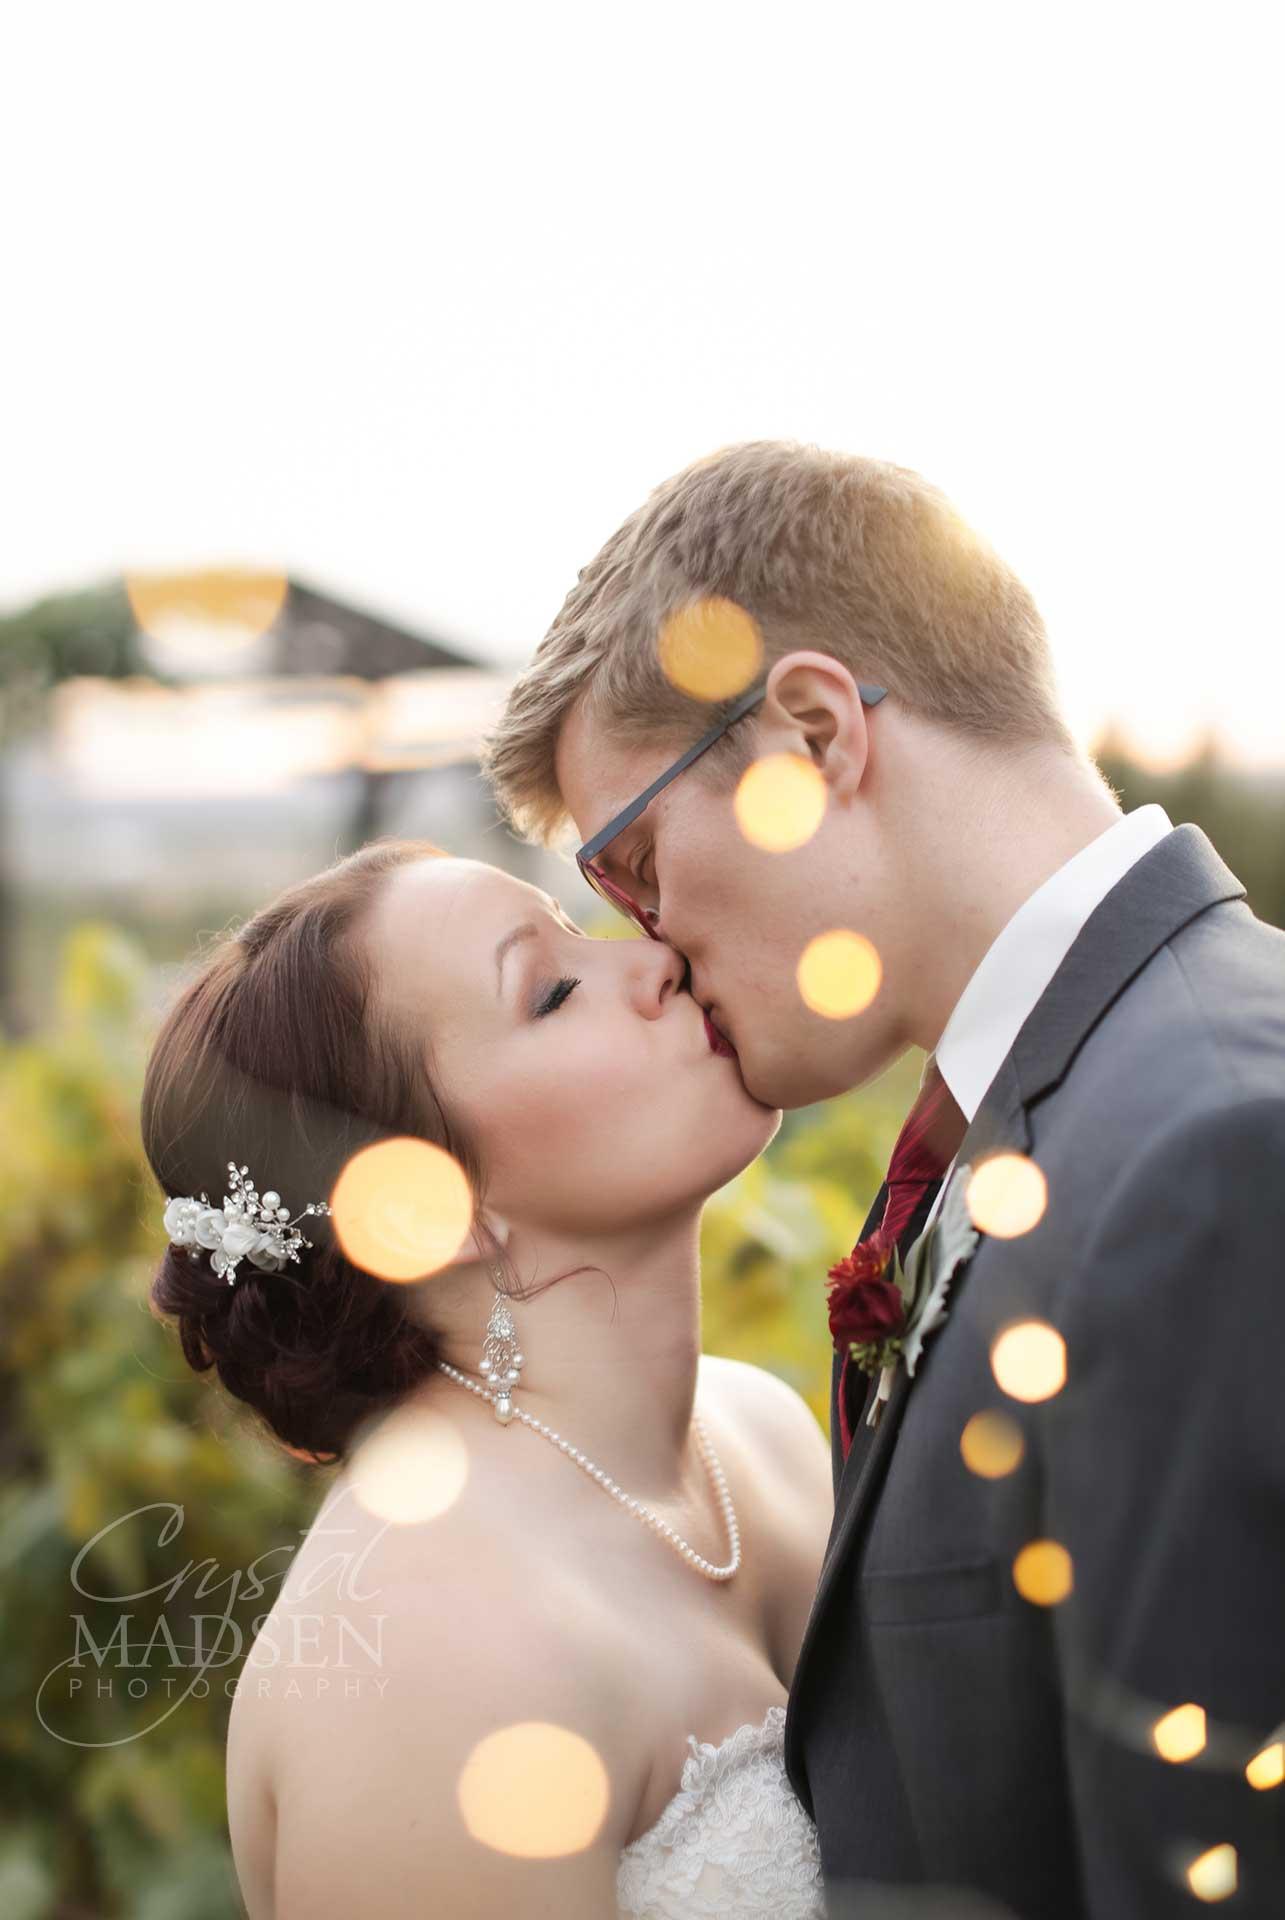 must have romantic wedding photos